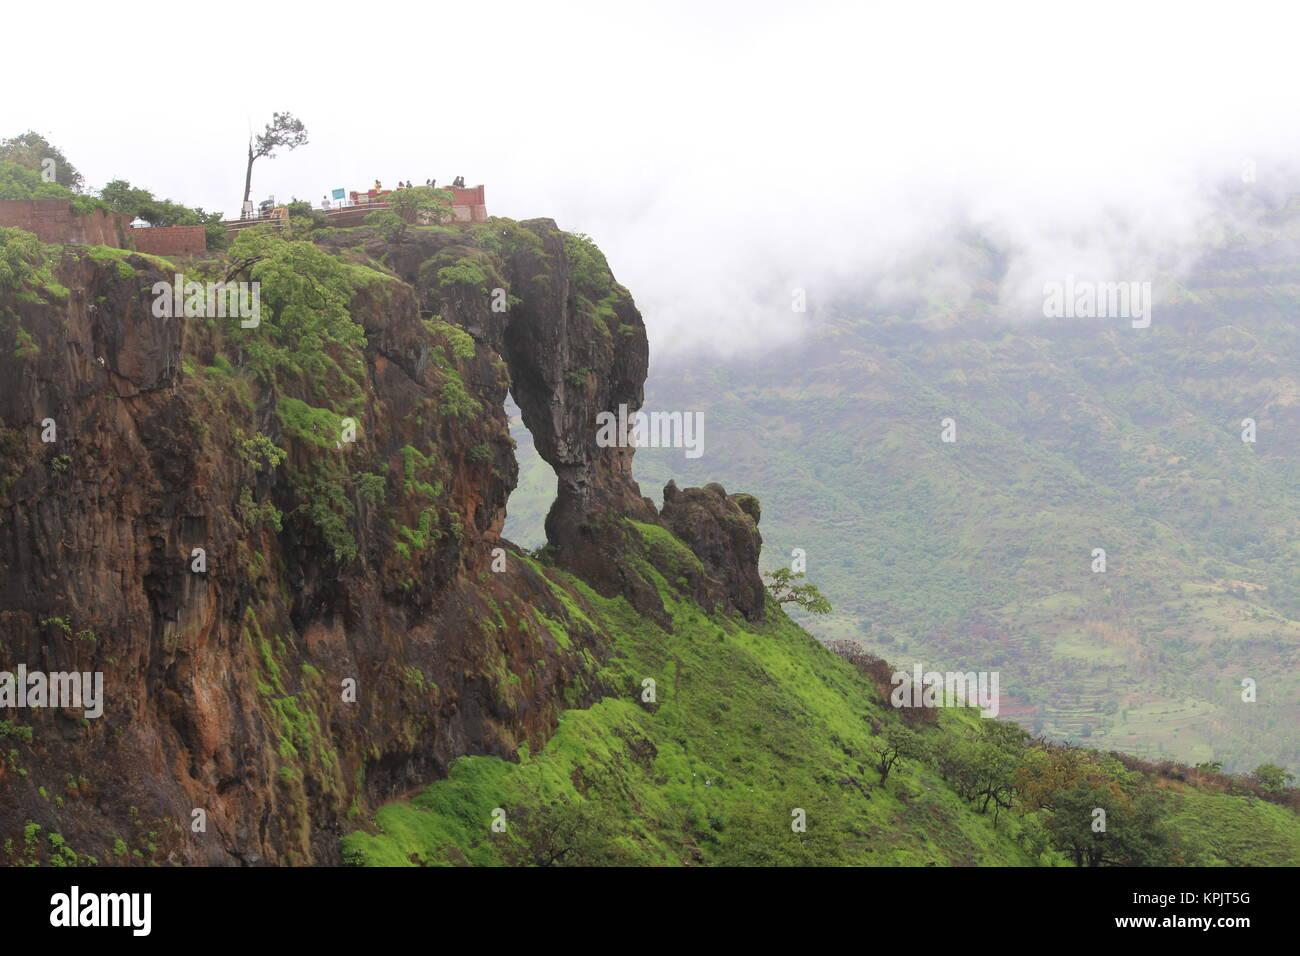 Elephant caves at mahabaleshwar hill station. Stock Photo